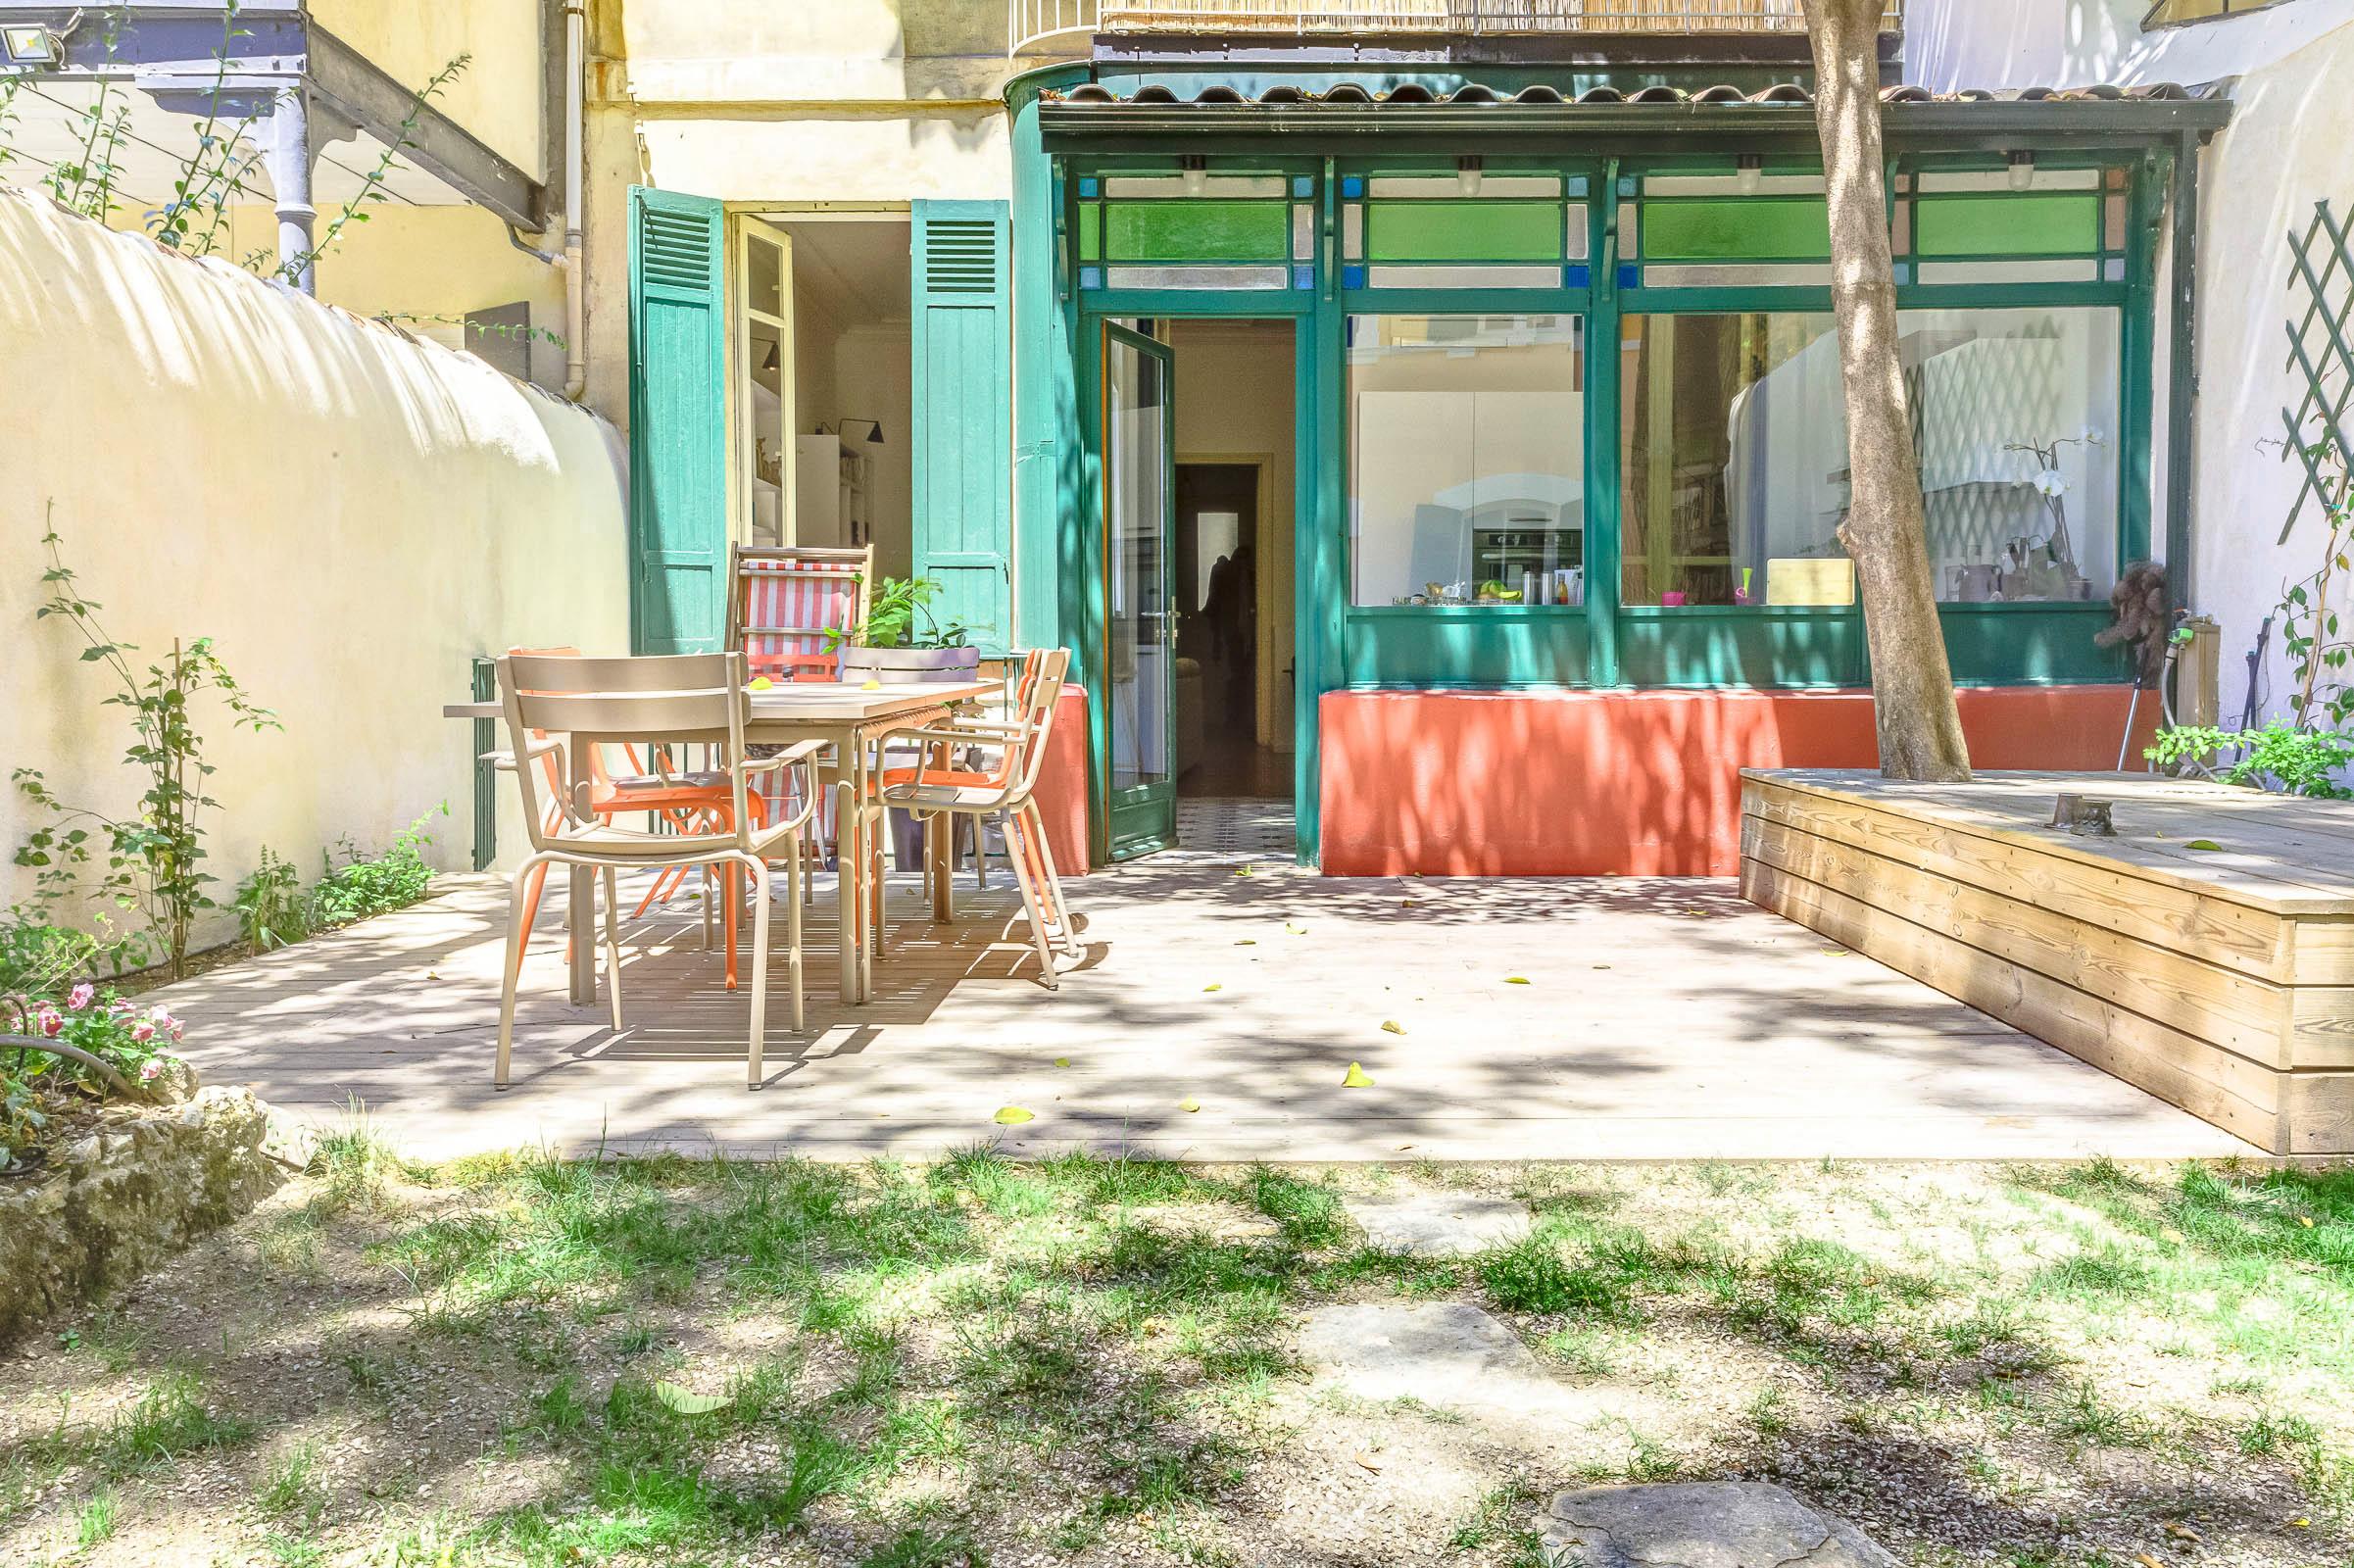 charmant t6 avec jardin plein sud 6 me ma terrasse marseille. Black Bedroom Furniture Sets. Home Design Ideas